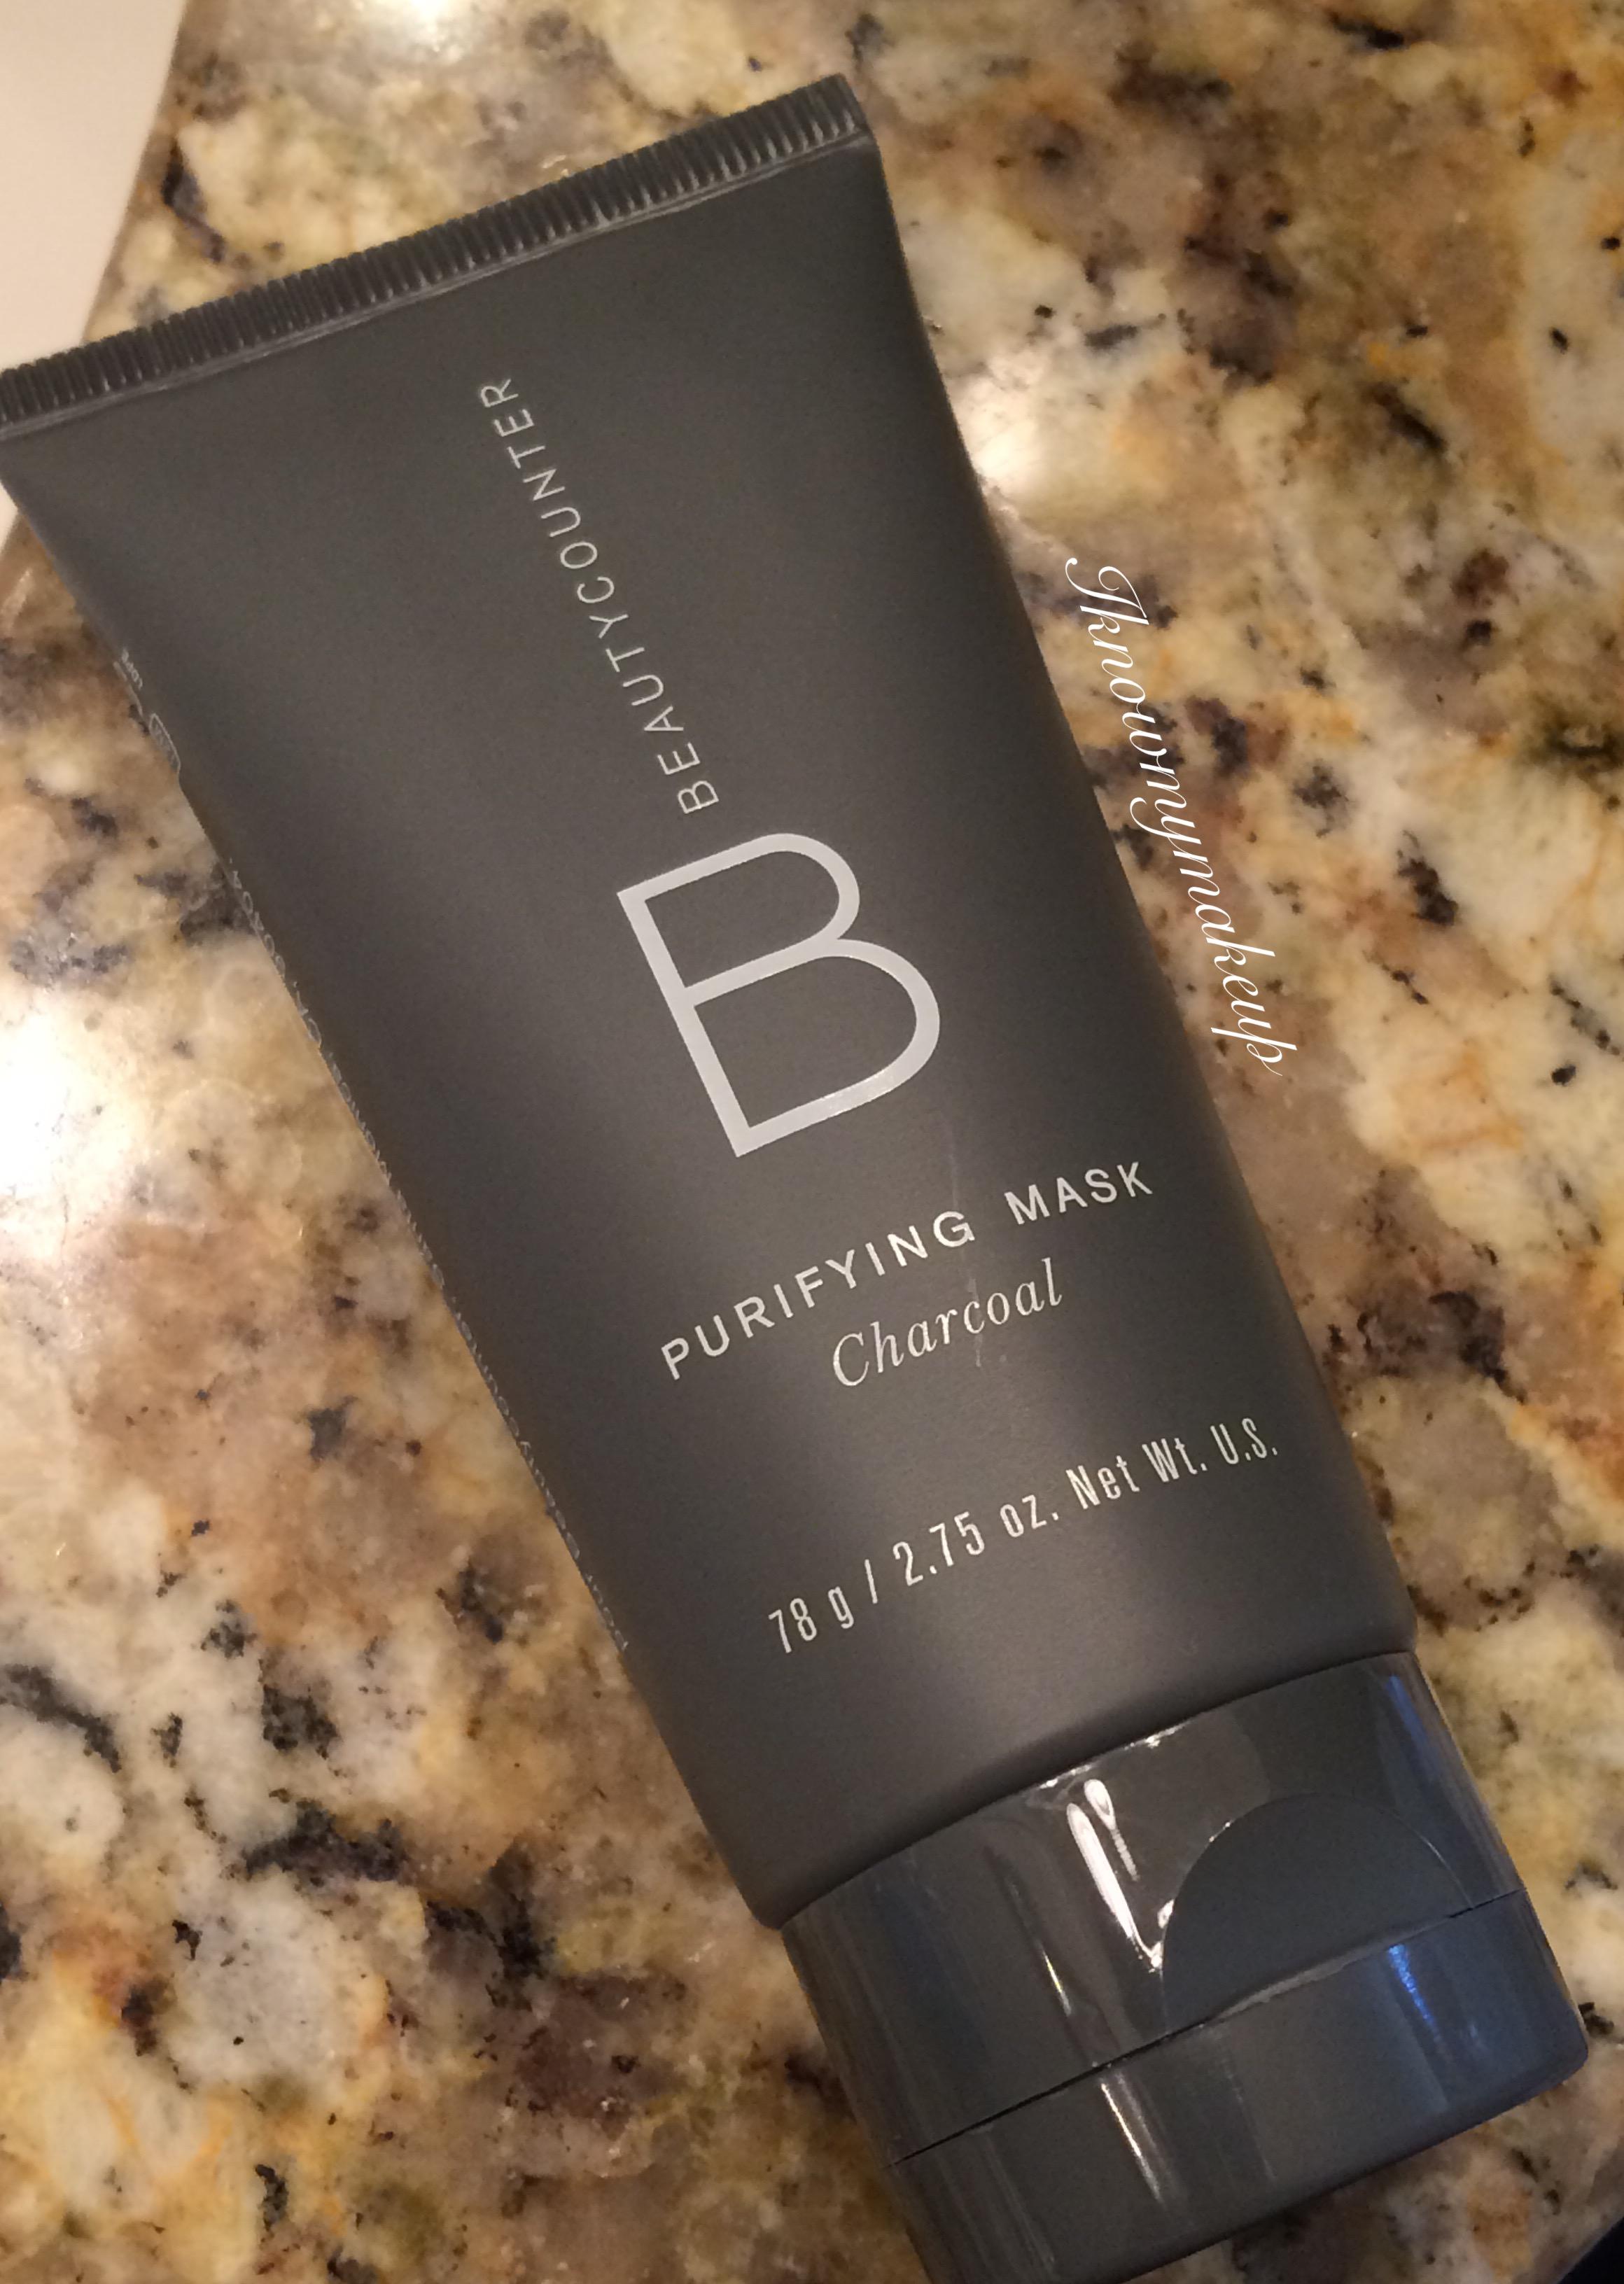 Beautycounter Purifying Charcoal Mask